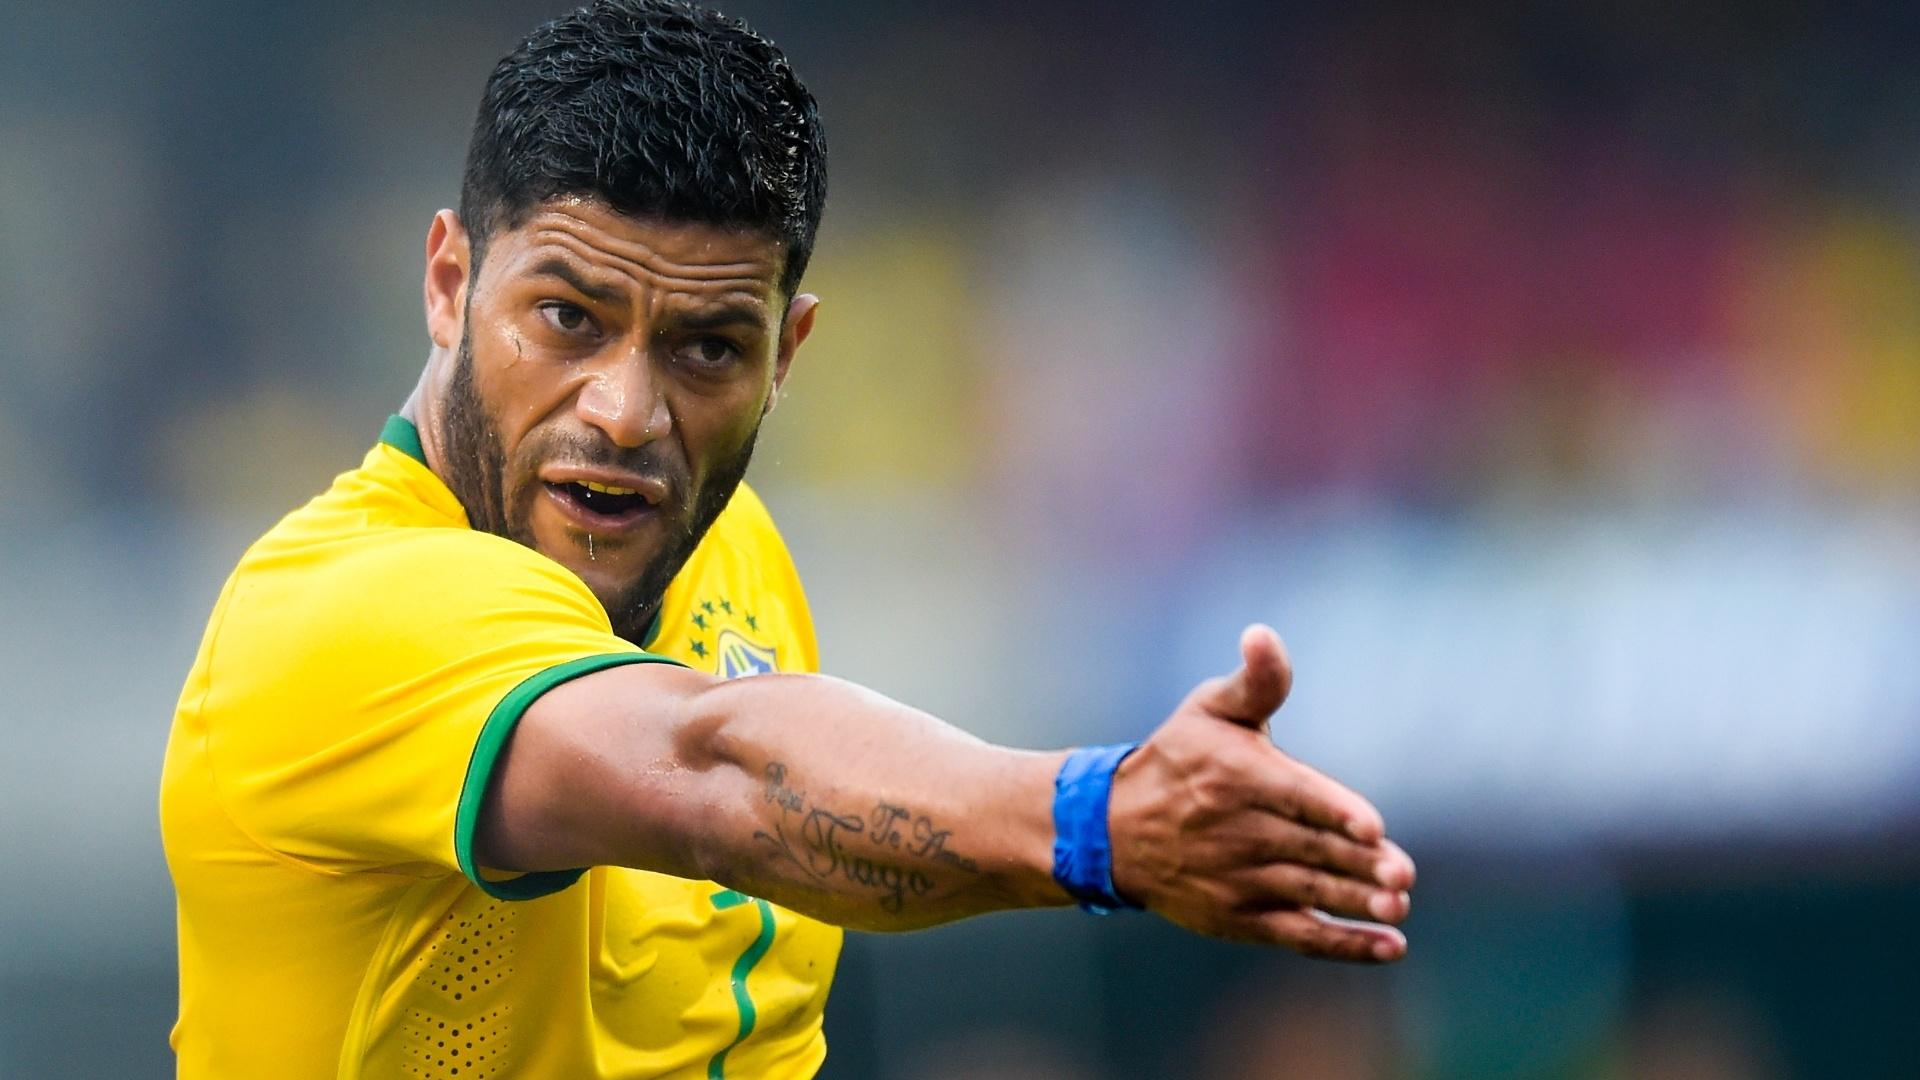 Hulk gesticula durante partida amistosa entre Brasil e Sérvia, no estádio do Morumbi